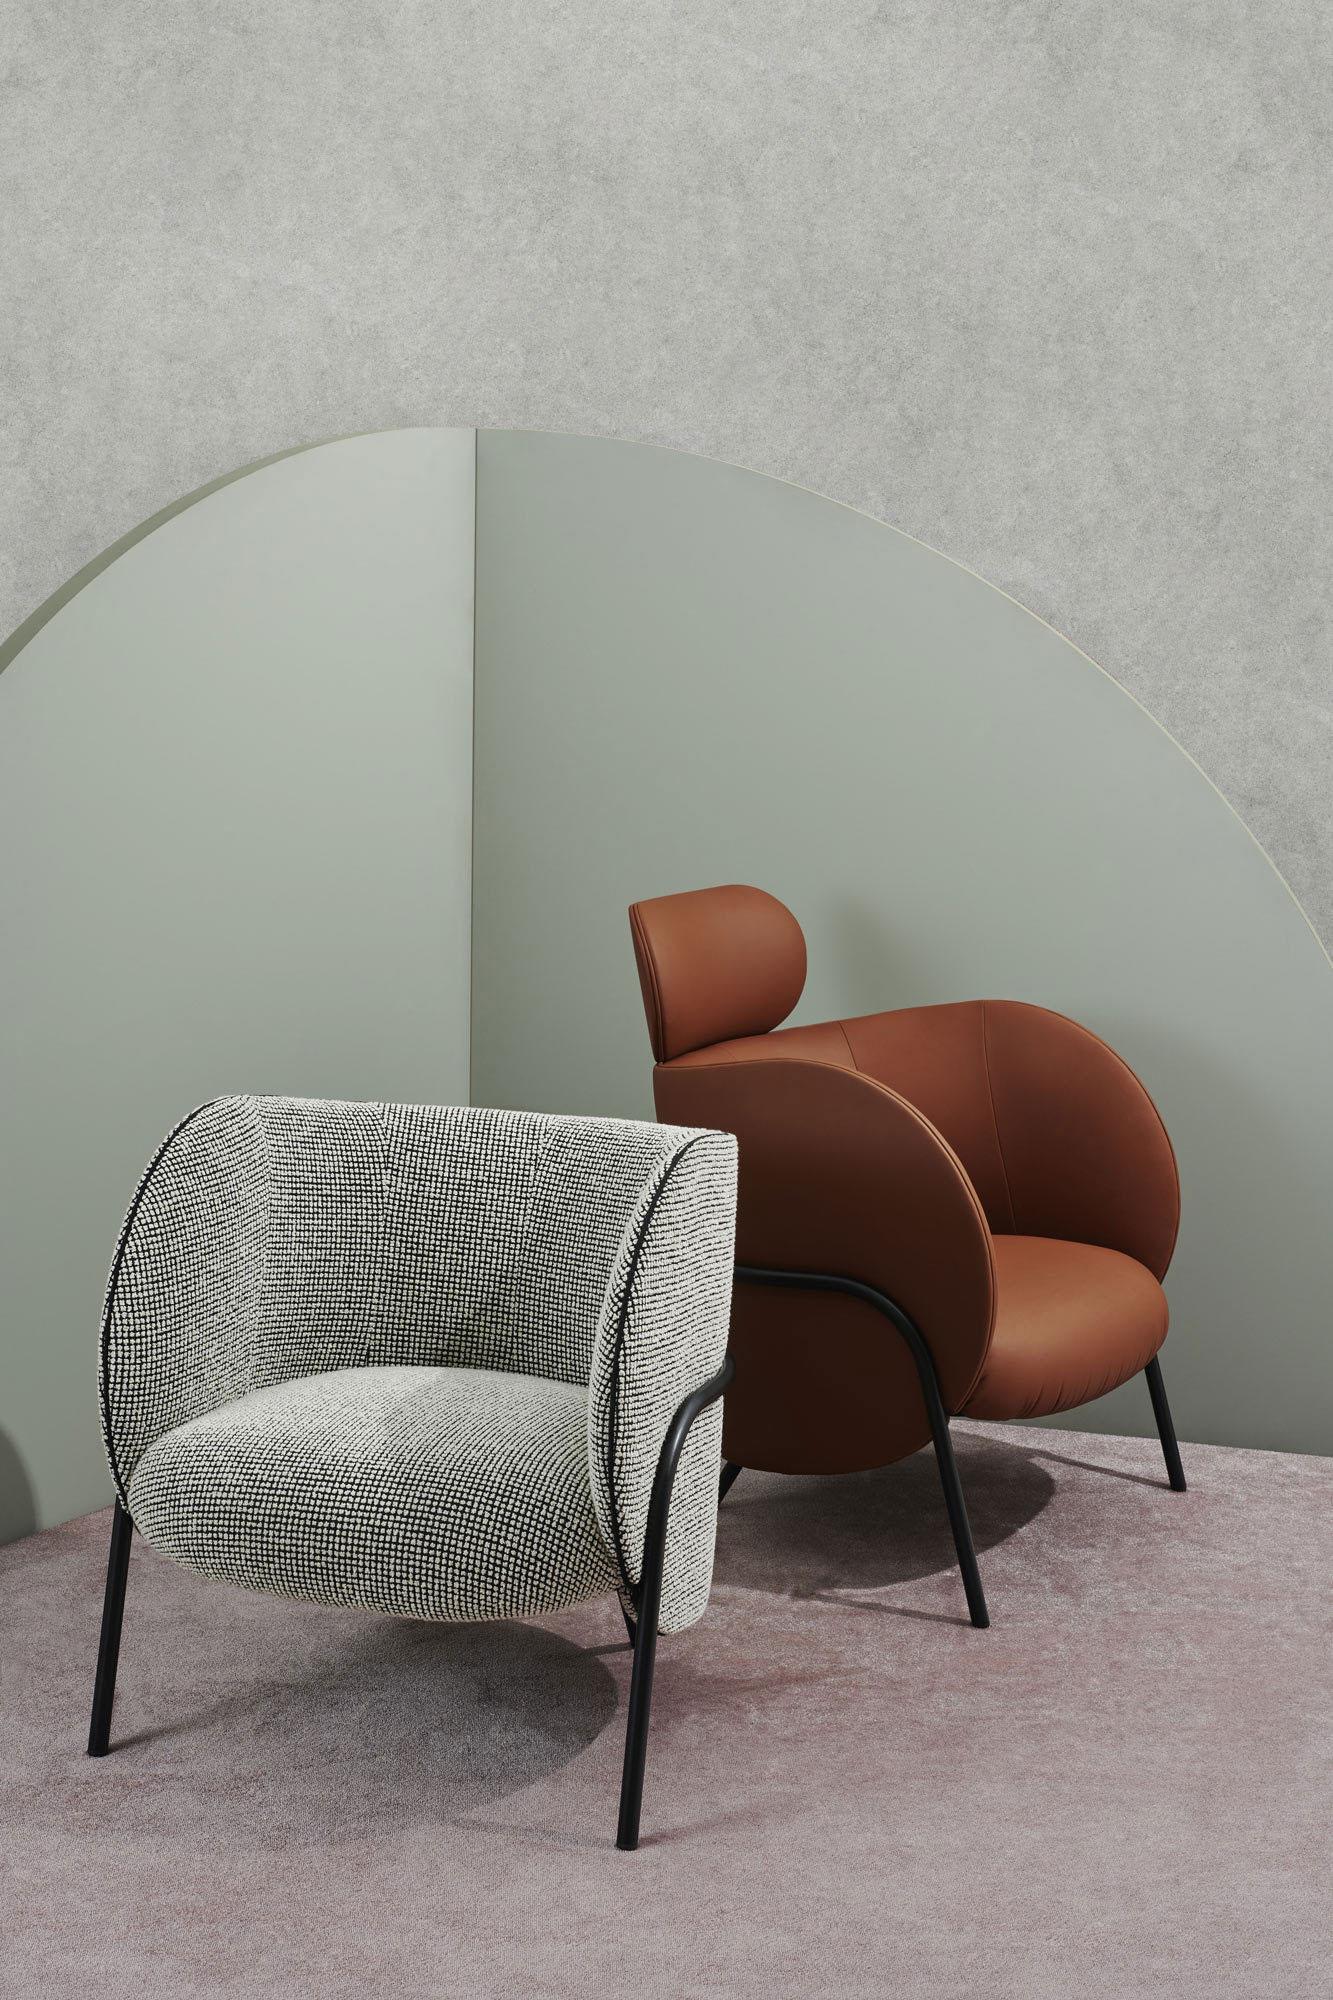 Kompakter Sessel von Nikolai Kotlarczyk für SP01 Design